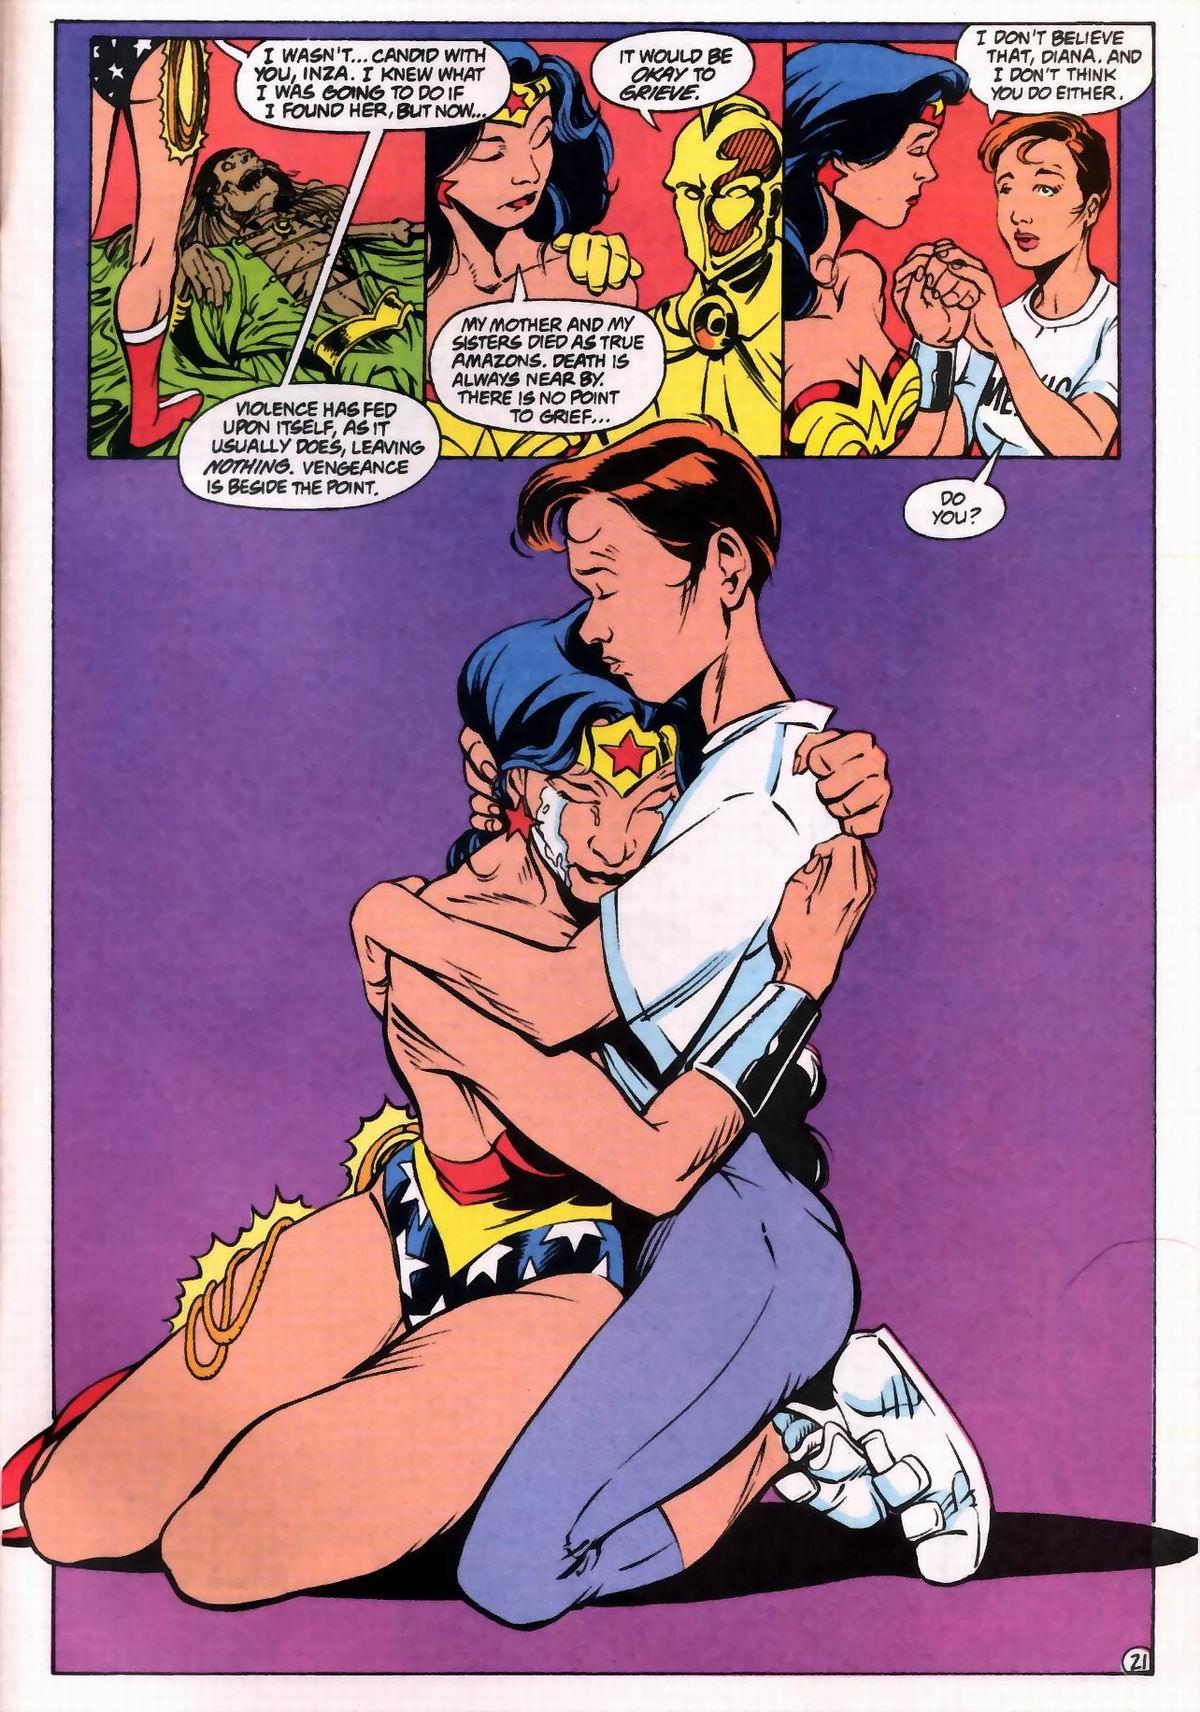 Read online Wonder Woman (1987) comic -  Issue #76 - 21